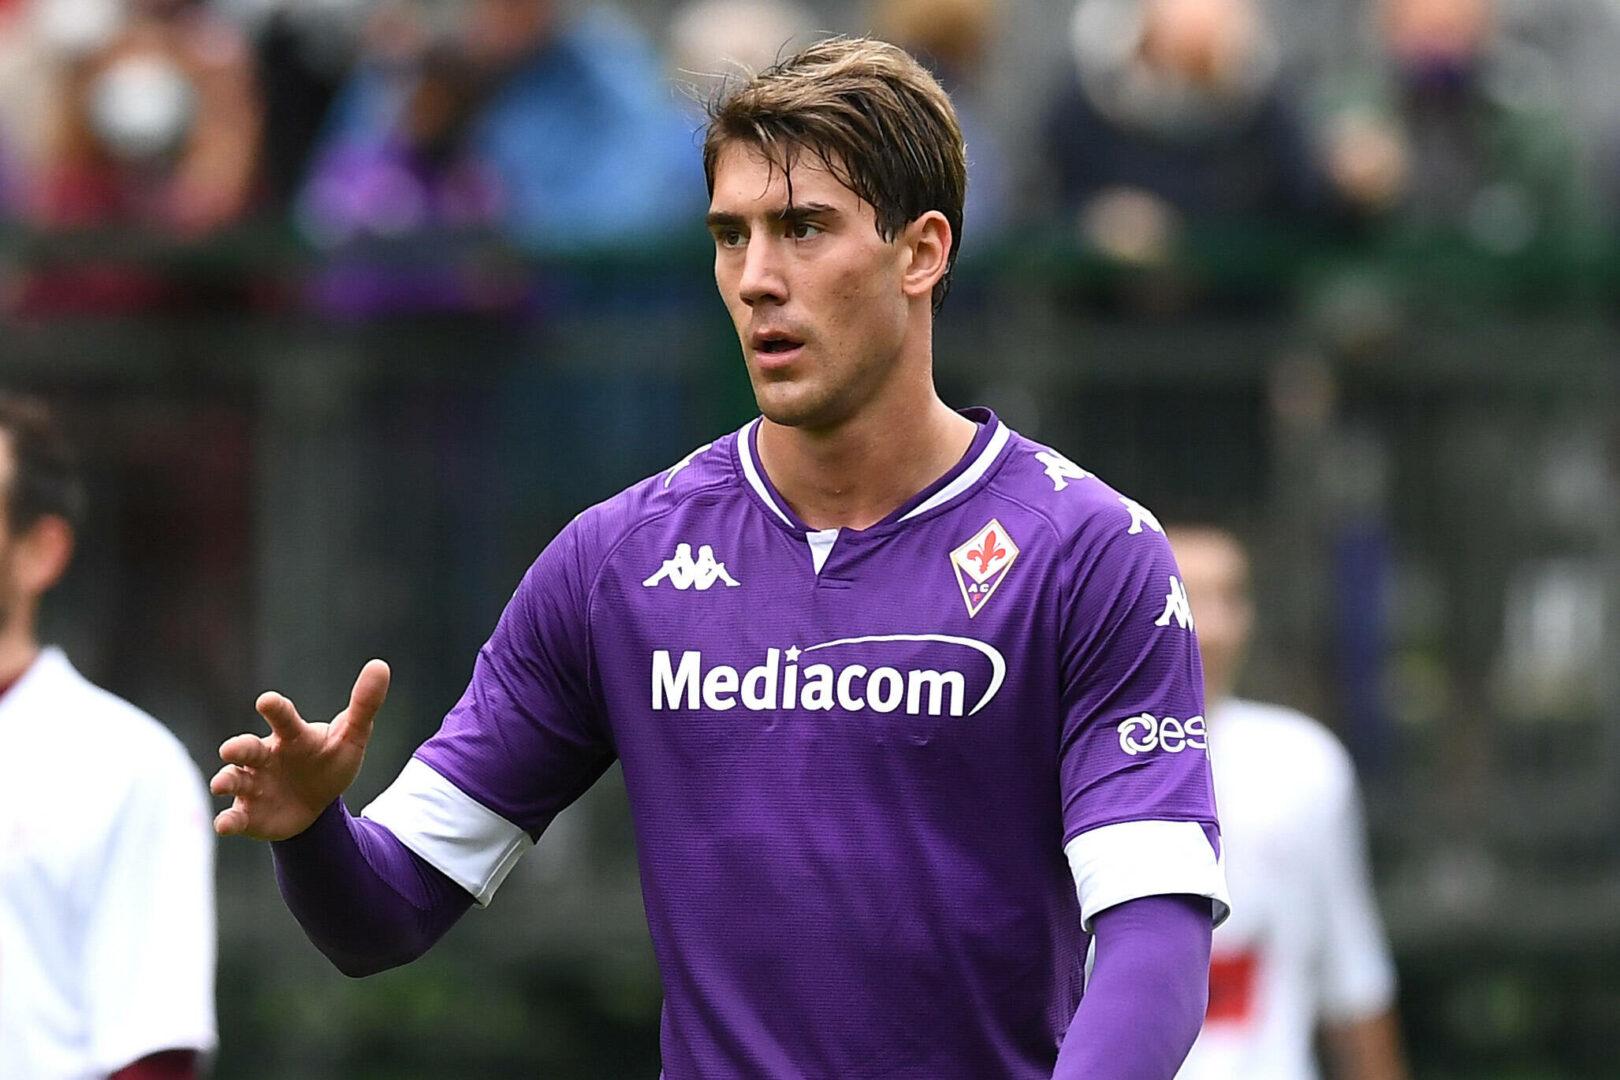 Fiorentina | Arsenal, Atletico und Tottenham mit Interesse an Vlahovic